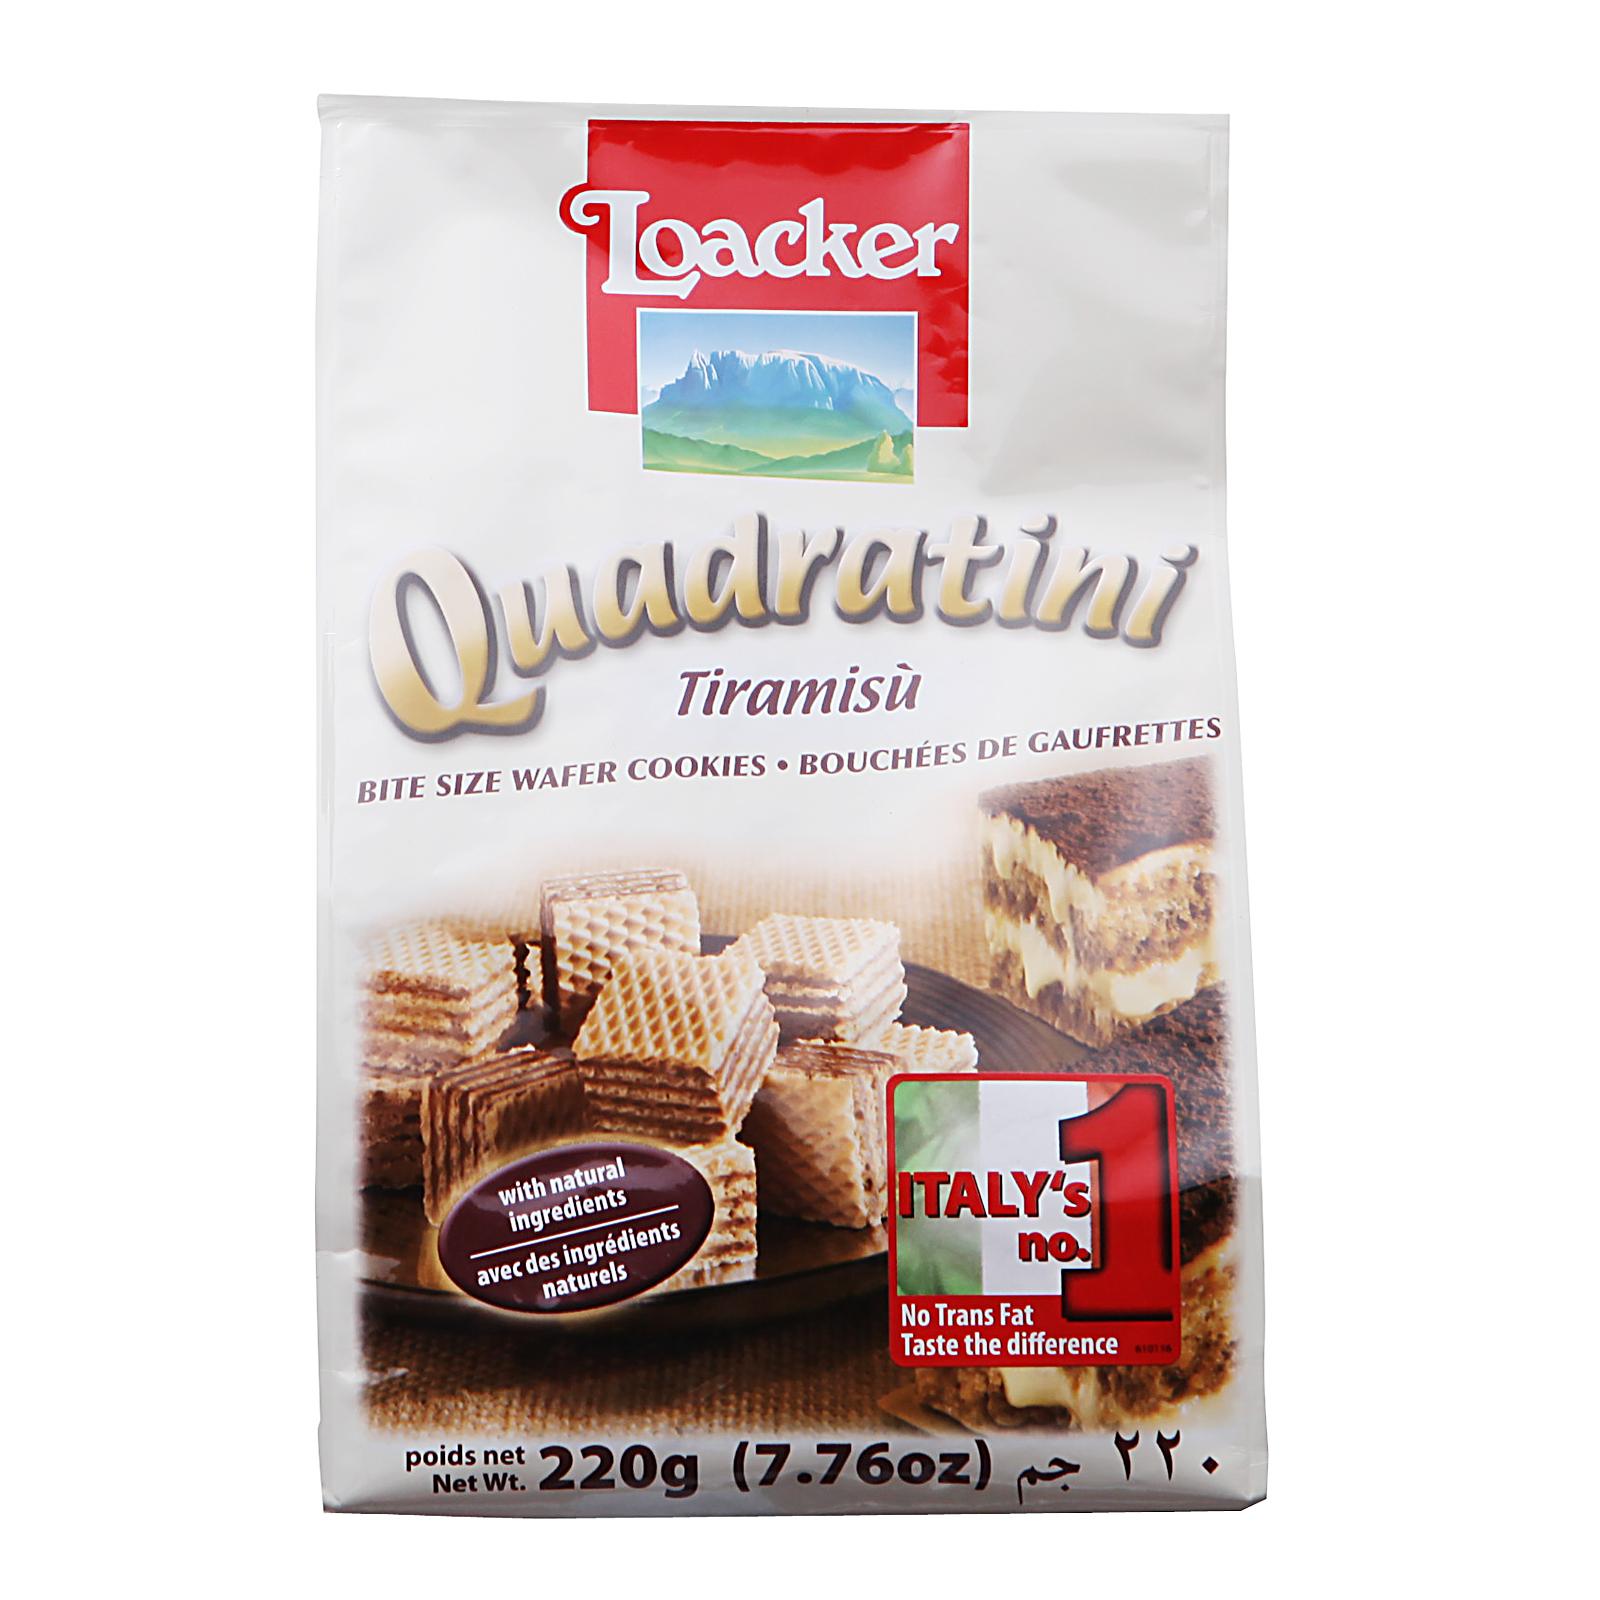 Loacker Wafer Cookies Quadratini Tiramisu